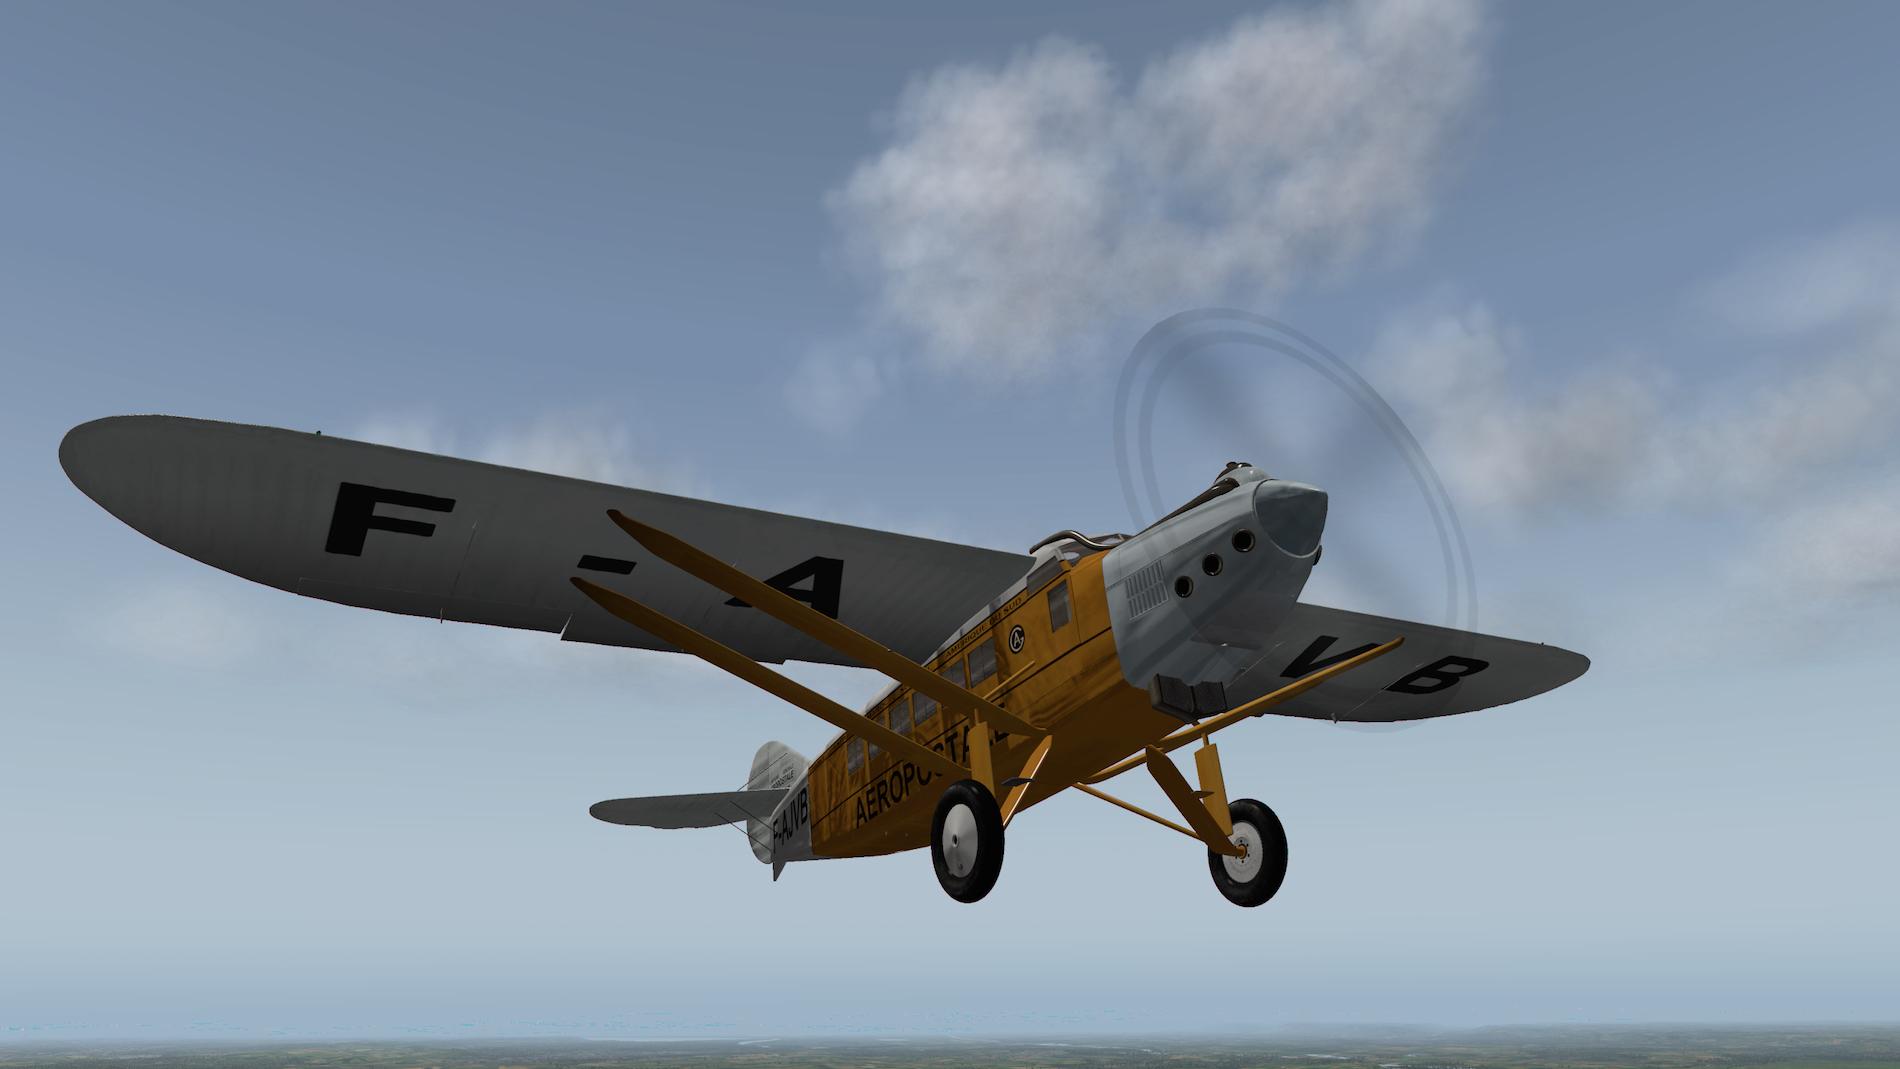 XPFR-Latécoère-28-02